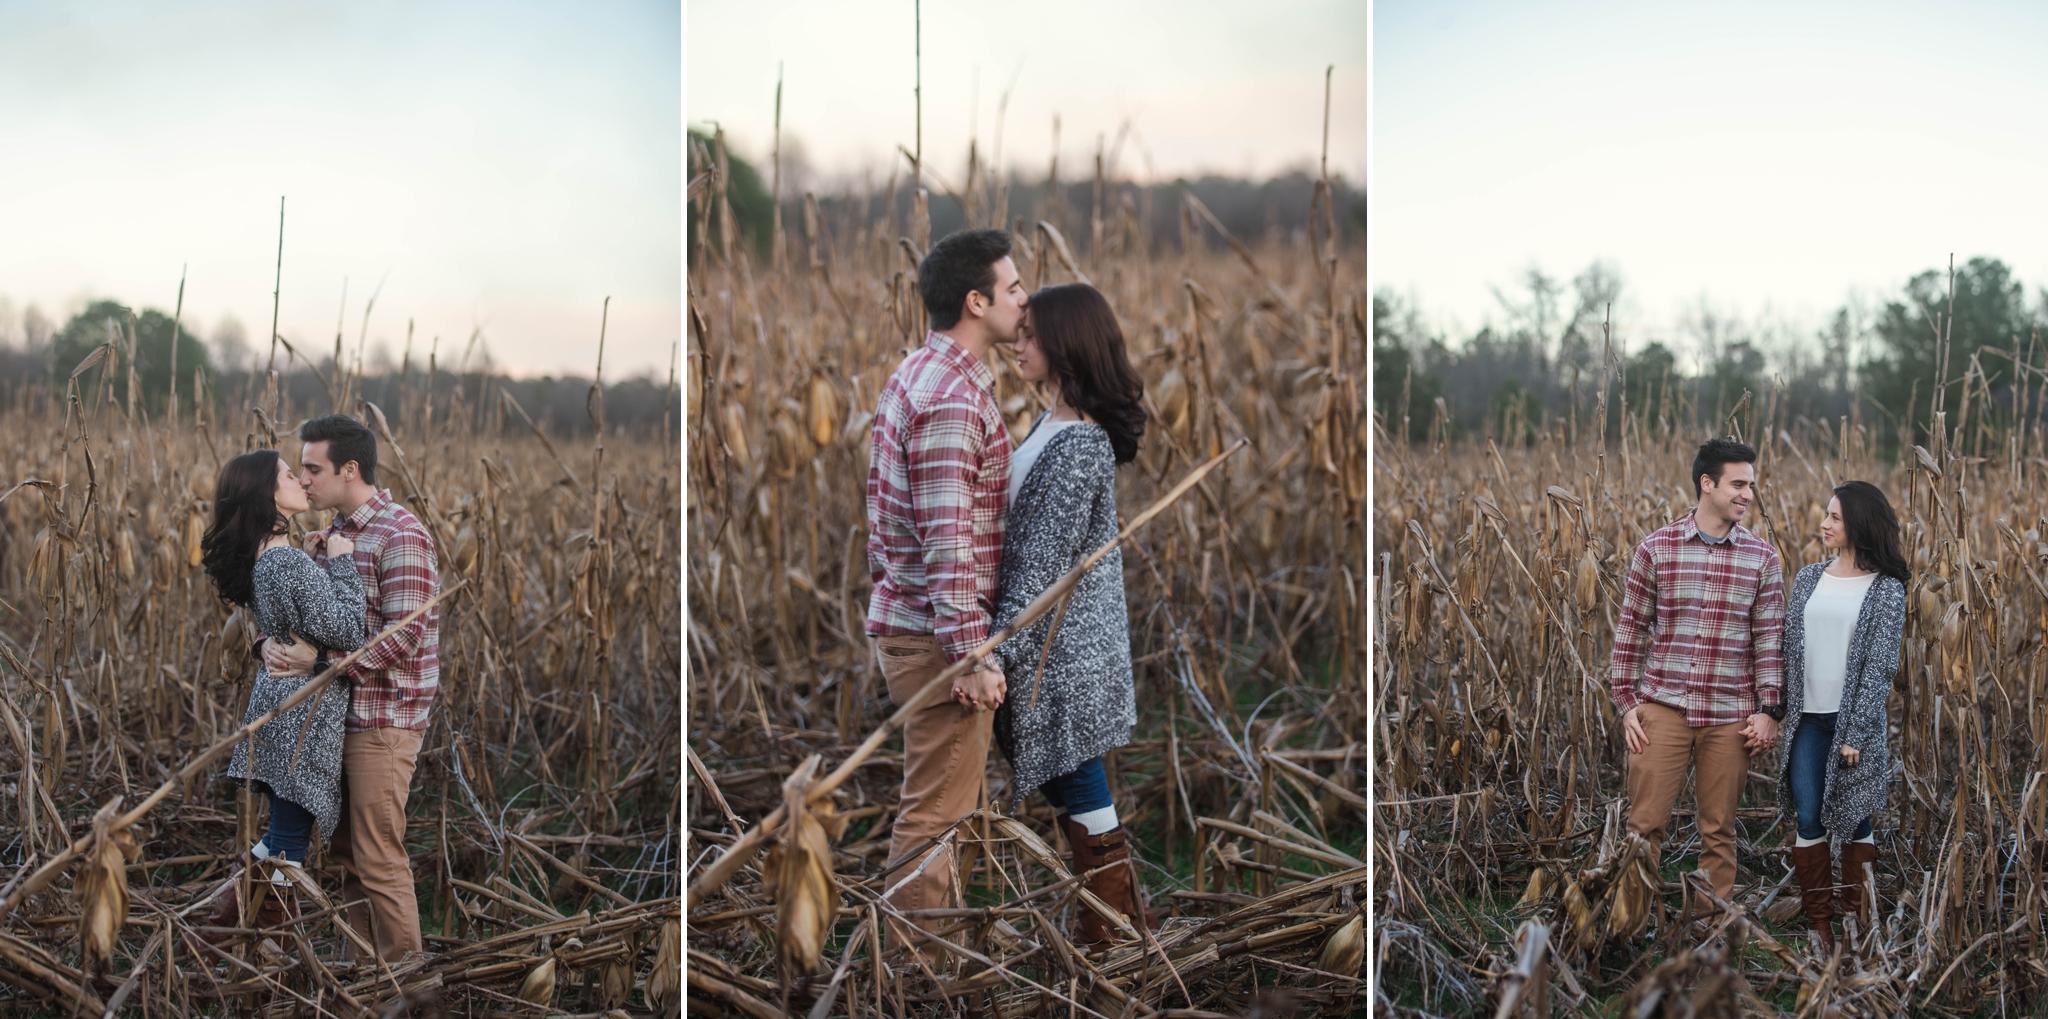 Raleigh+North+Carolina+Engagement+Photographer+-+Johanna+Dye+Photography+-++2.jpg